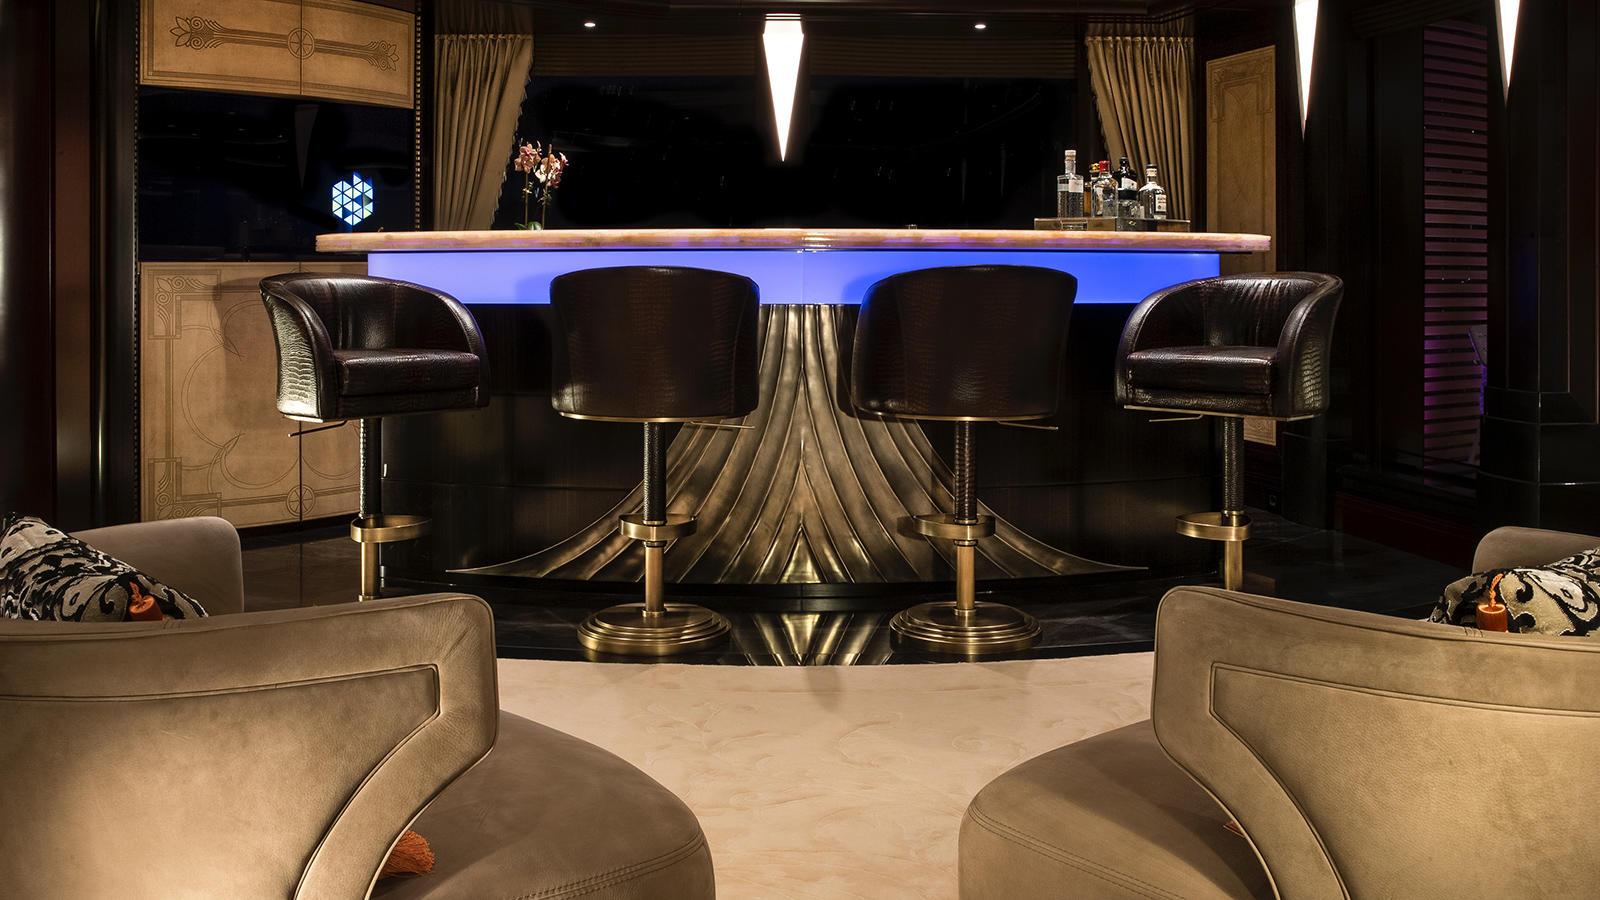 pm7lxNSBTlSarJBsNwmH_Kismet-super-yacht-lurssen-shahid-khan-95-metres-credit-guillaume-plisson-bar-1